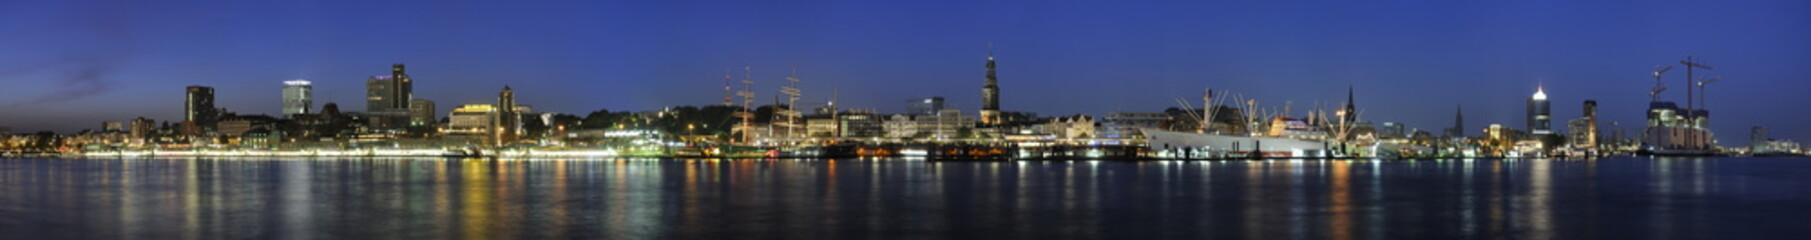 Fototapeta na wymiar Hamburg Landungsbrücken Panorama